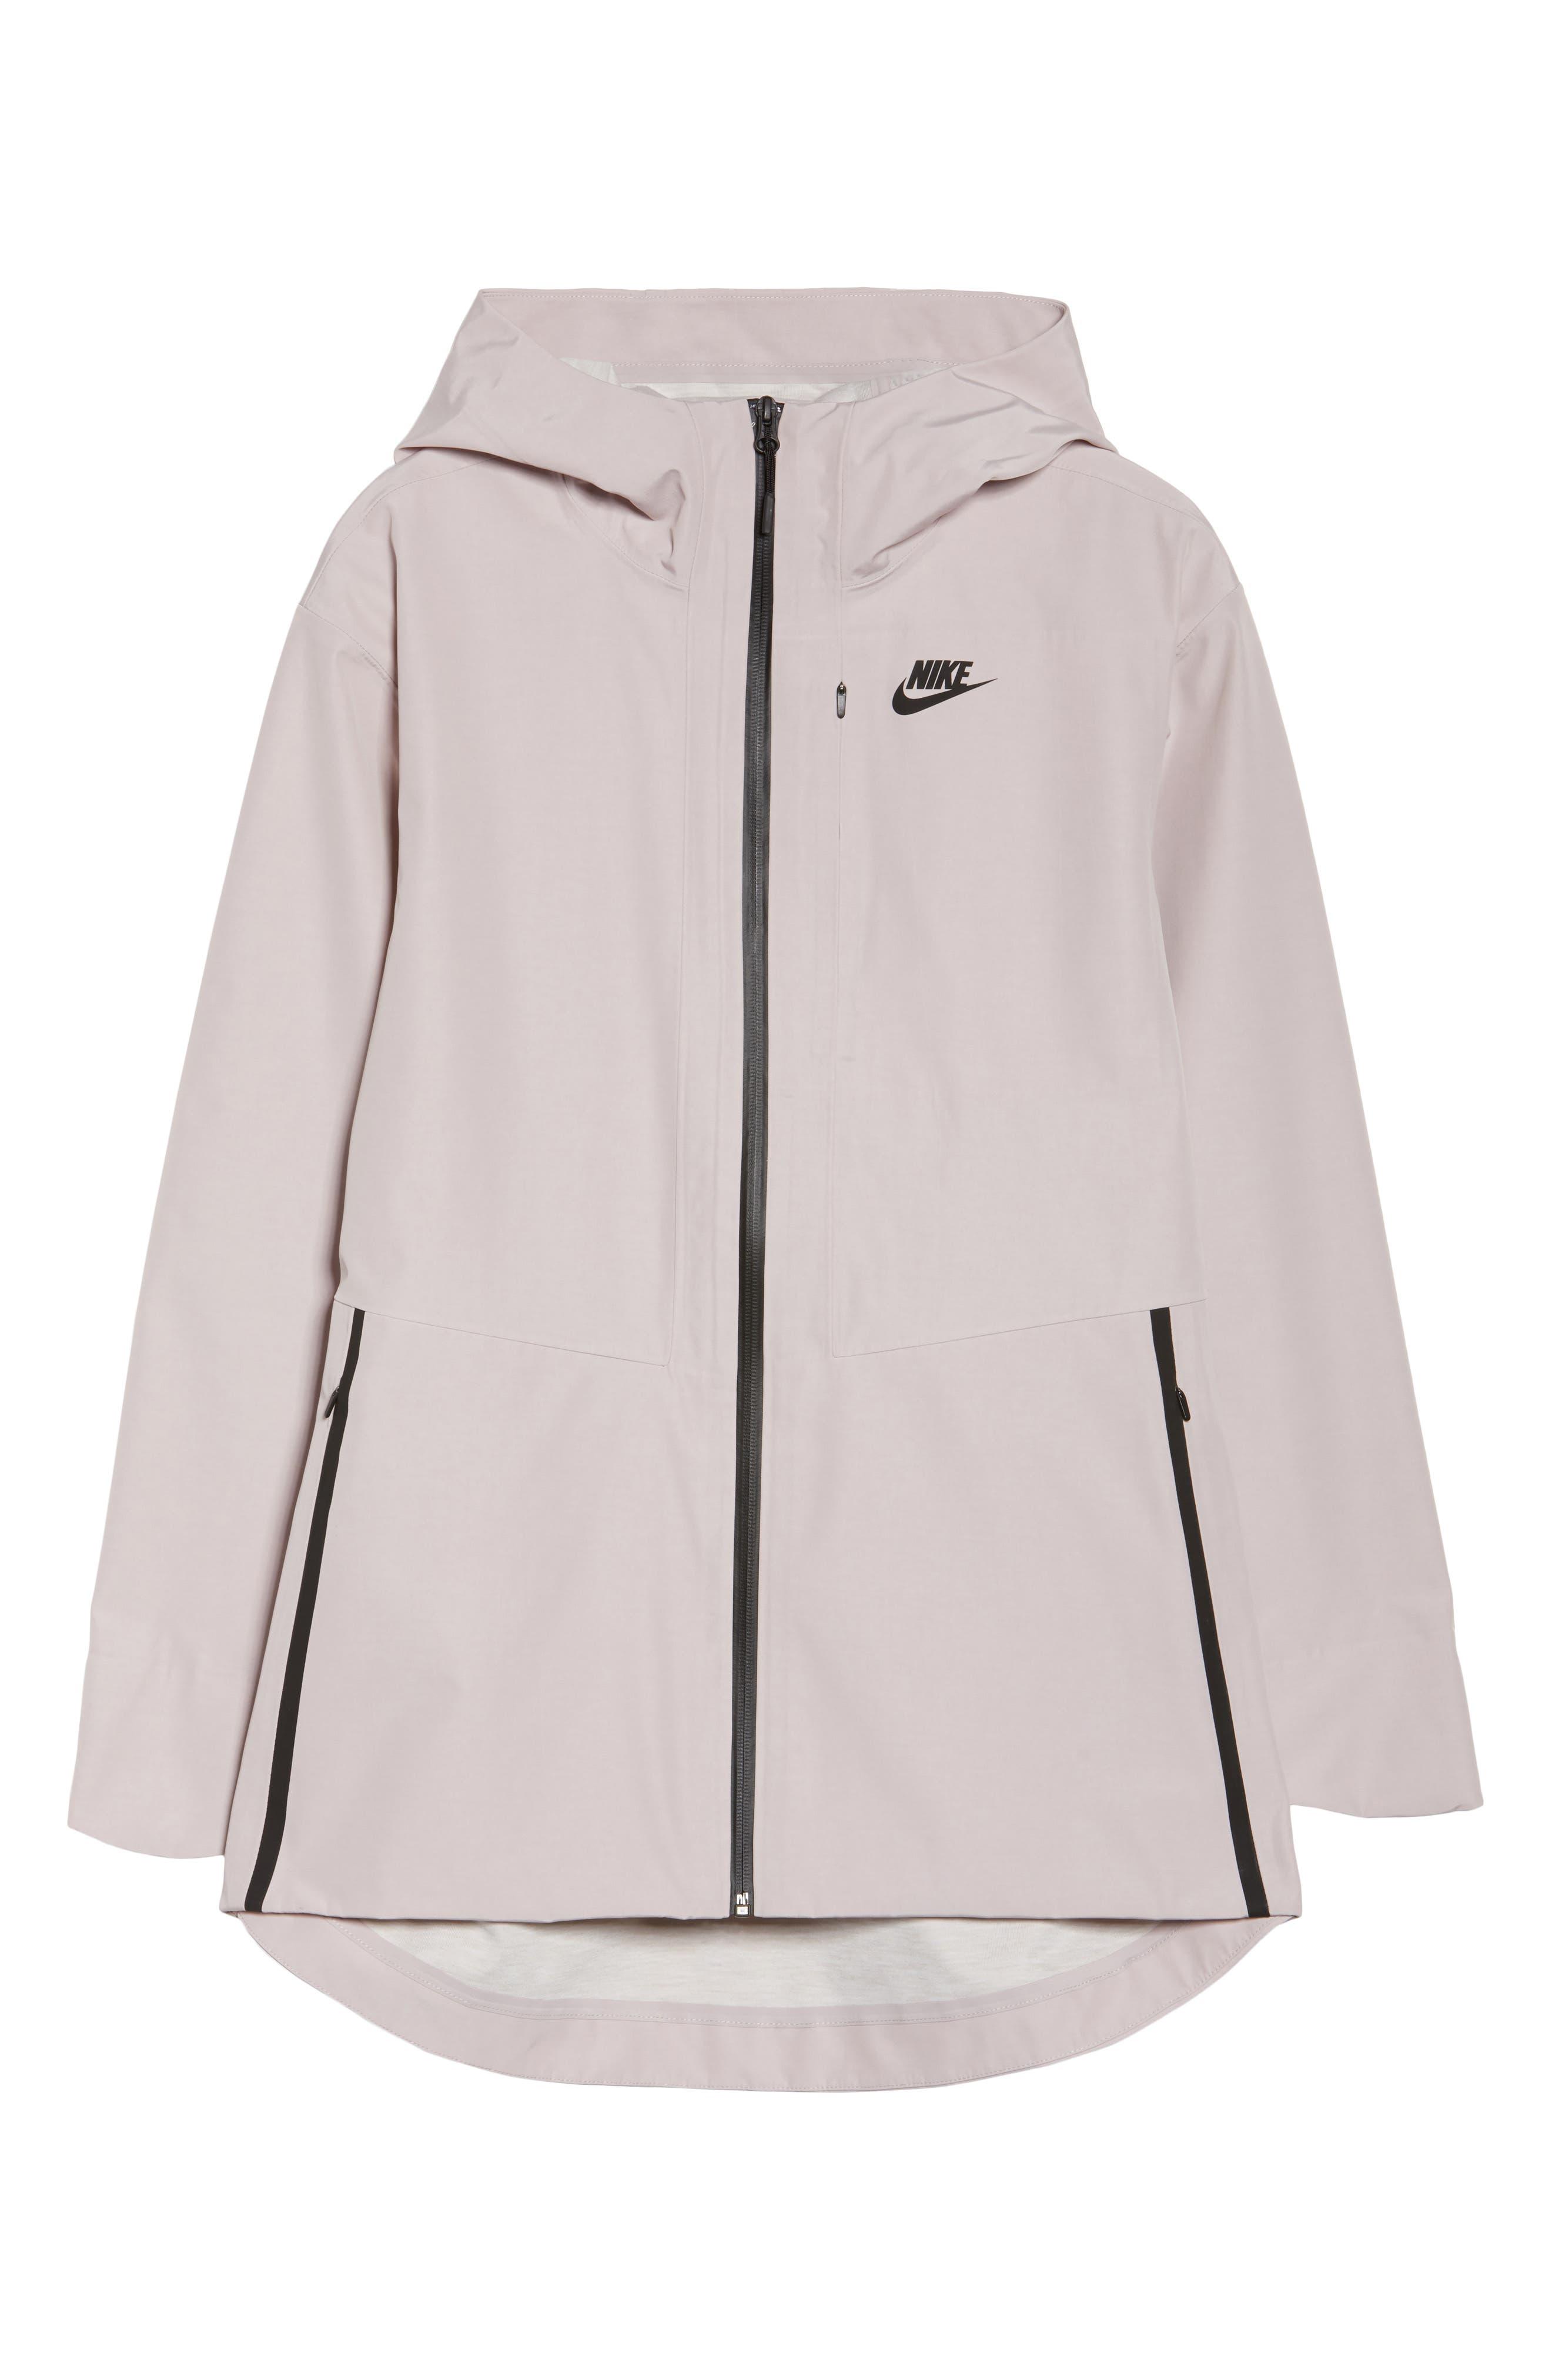 Sportswear Women's Tech Jacket,                             Alternate thumbnail 6, color,                             Particle Rose/ Black